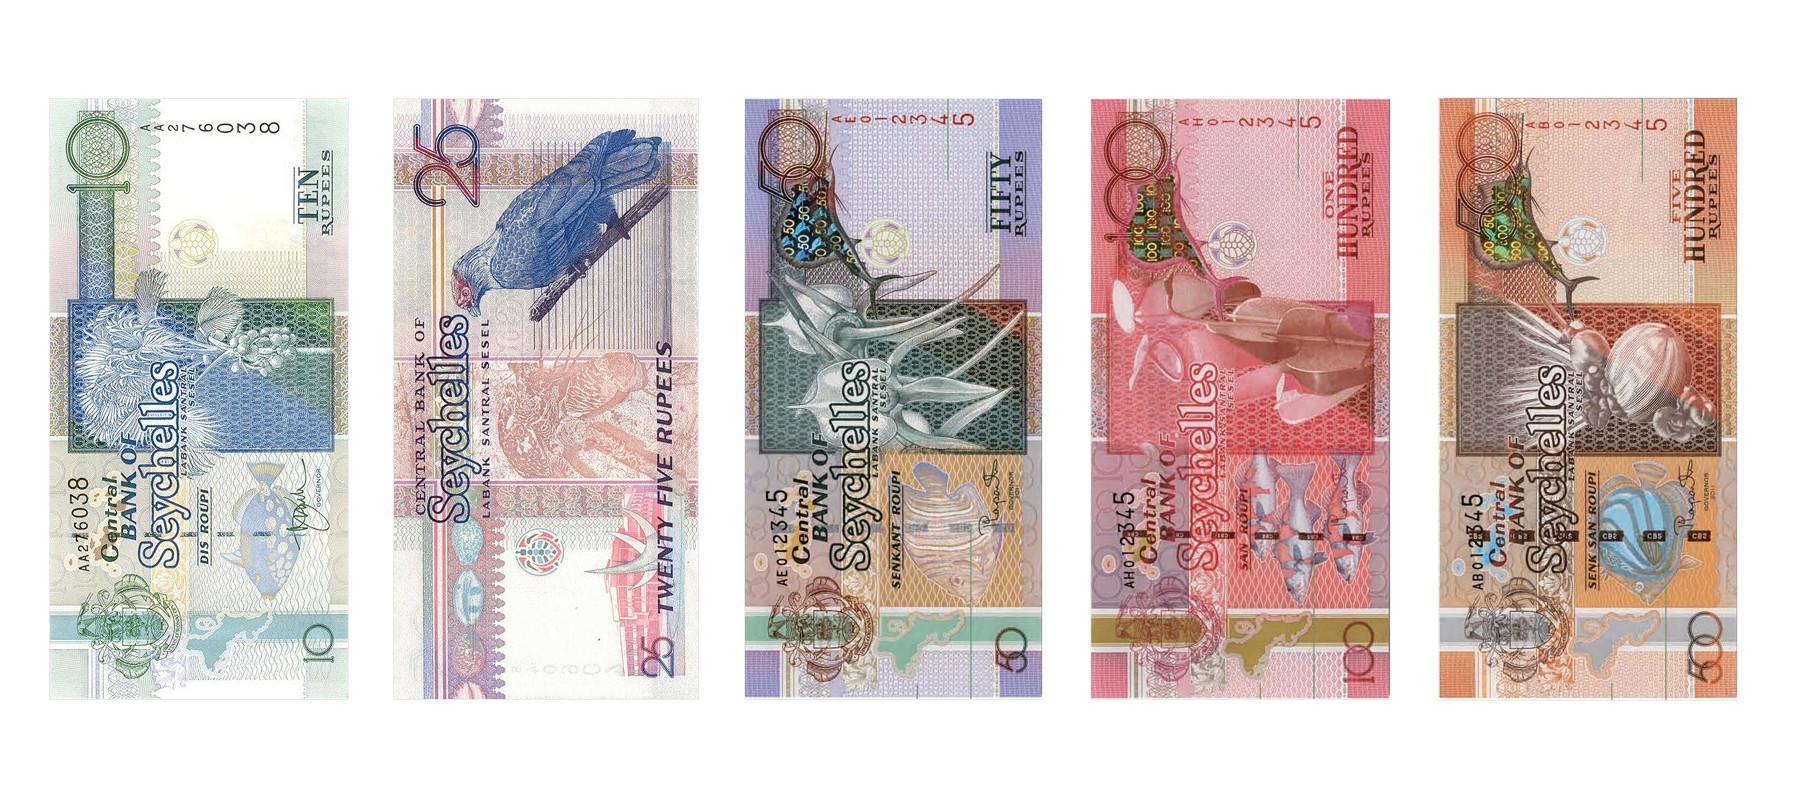 Geld abheben Seychellen - Banknoten